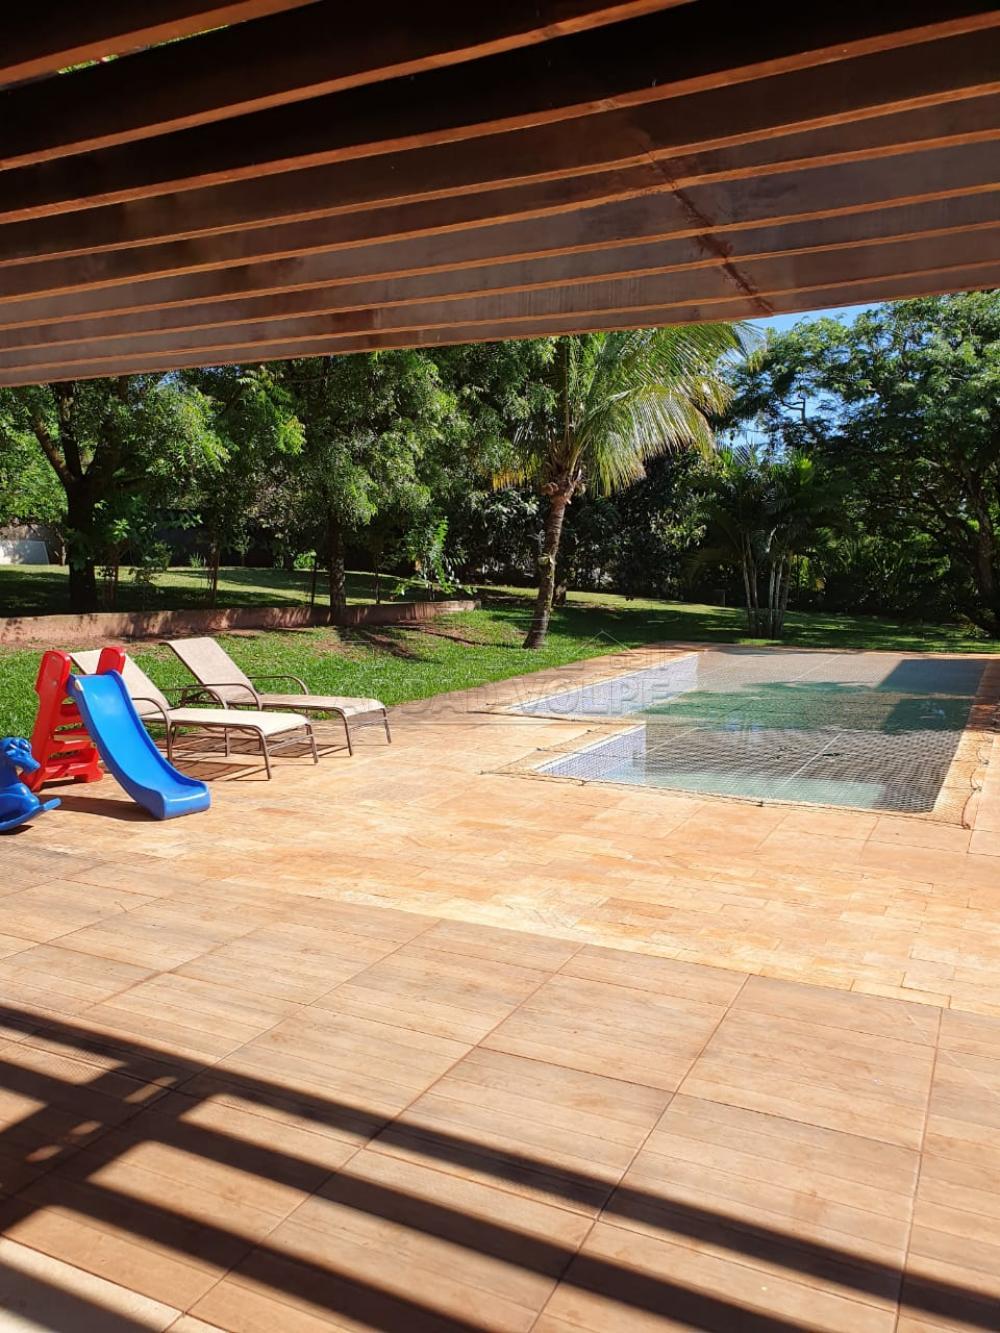 Comprar Casa / Condomínio em Bauru apenas R$ 2.700.000,00 - Foto 20